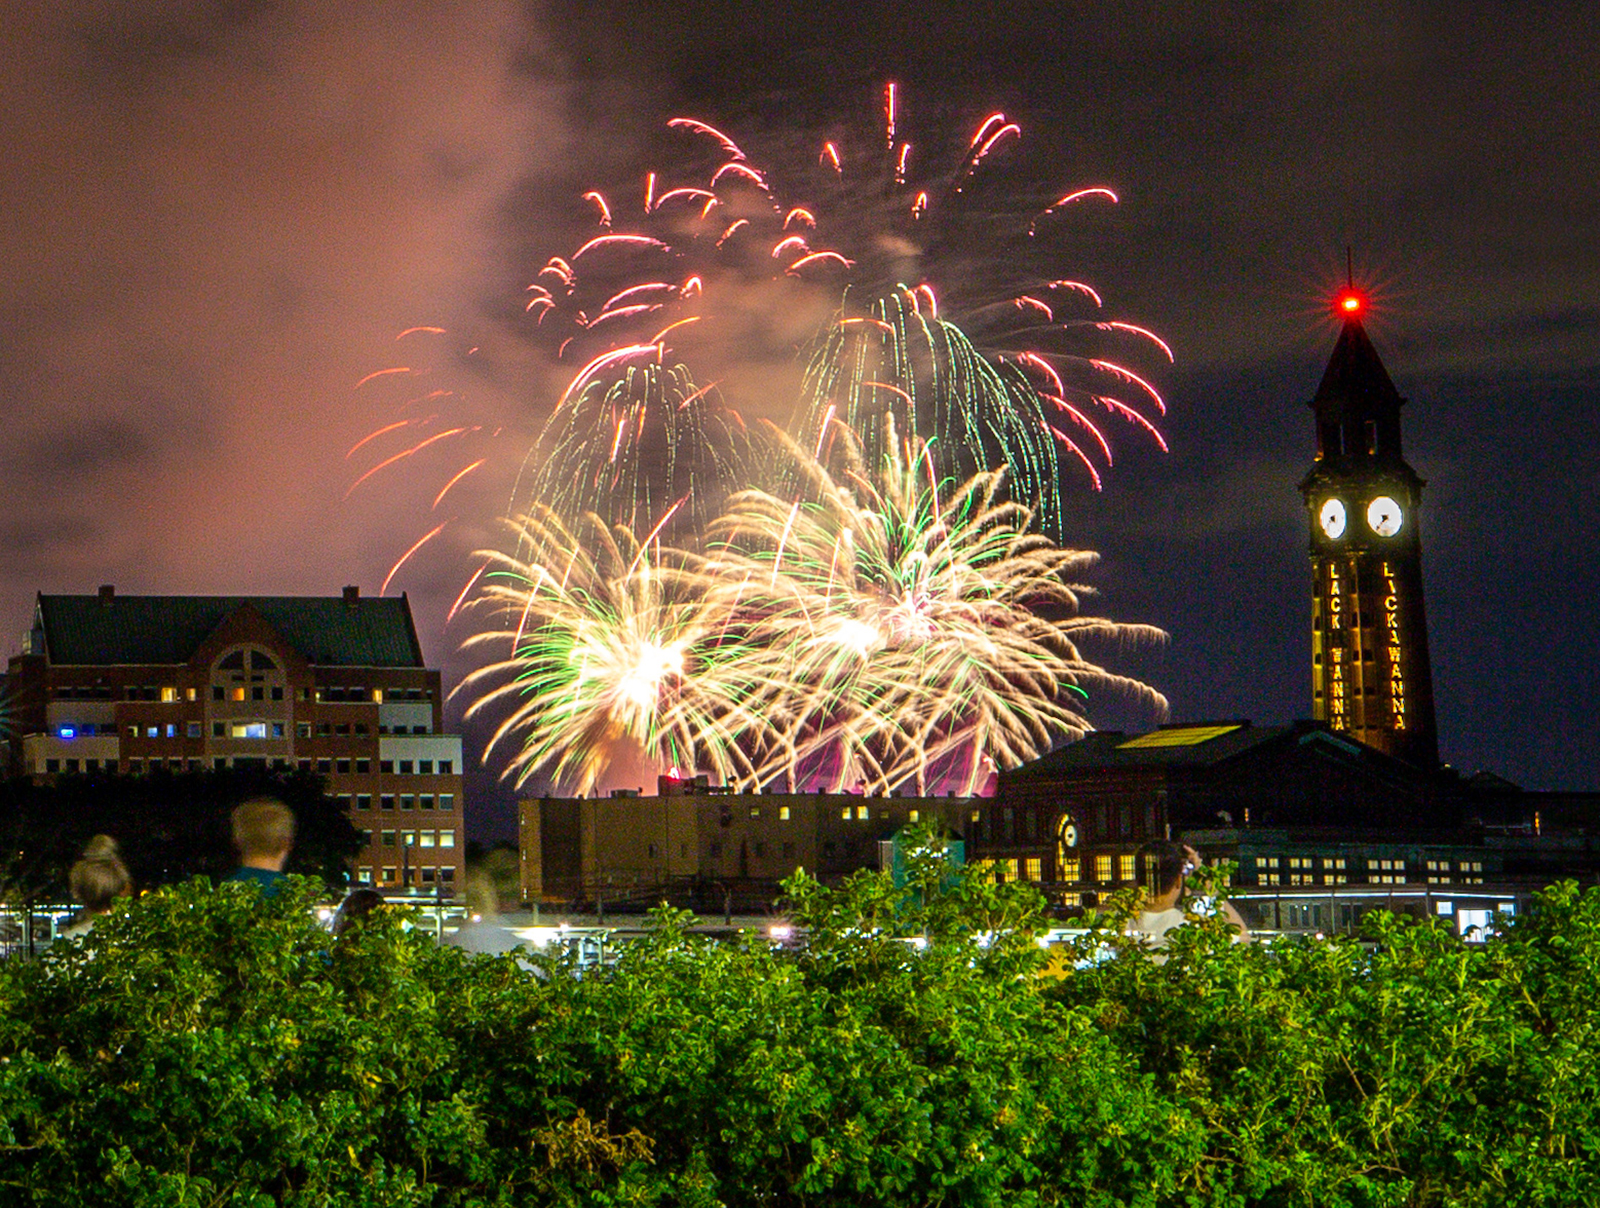 Fireworks light up the sky on June 30, in New York City.